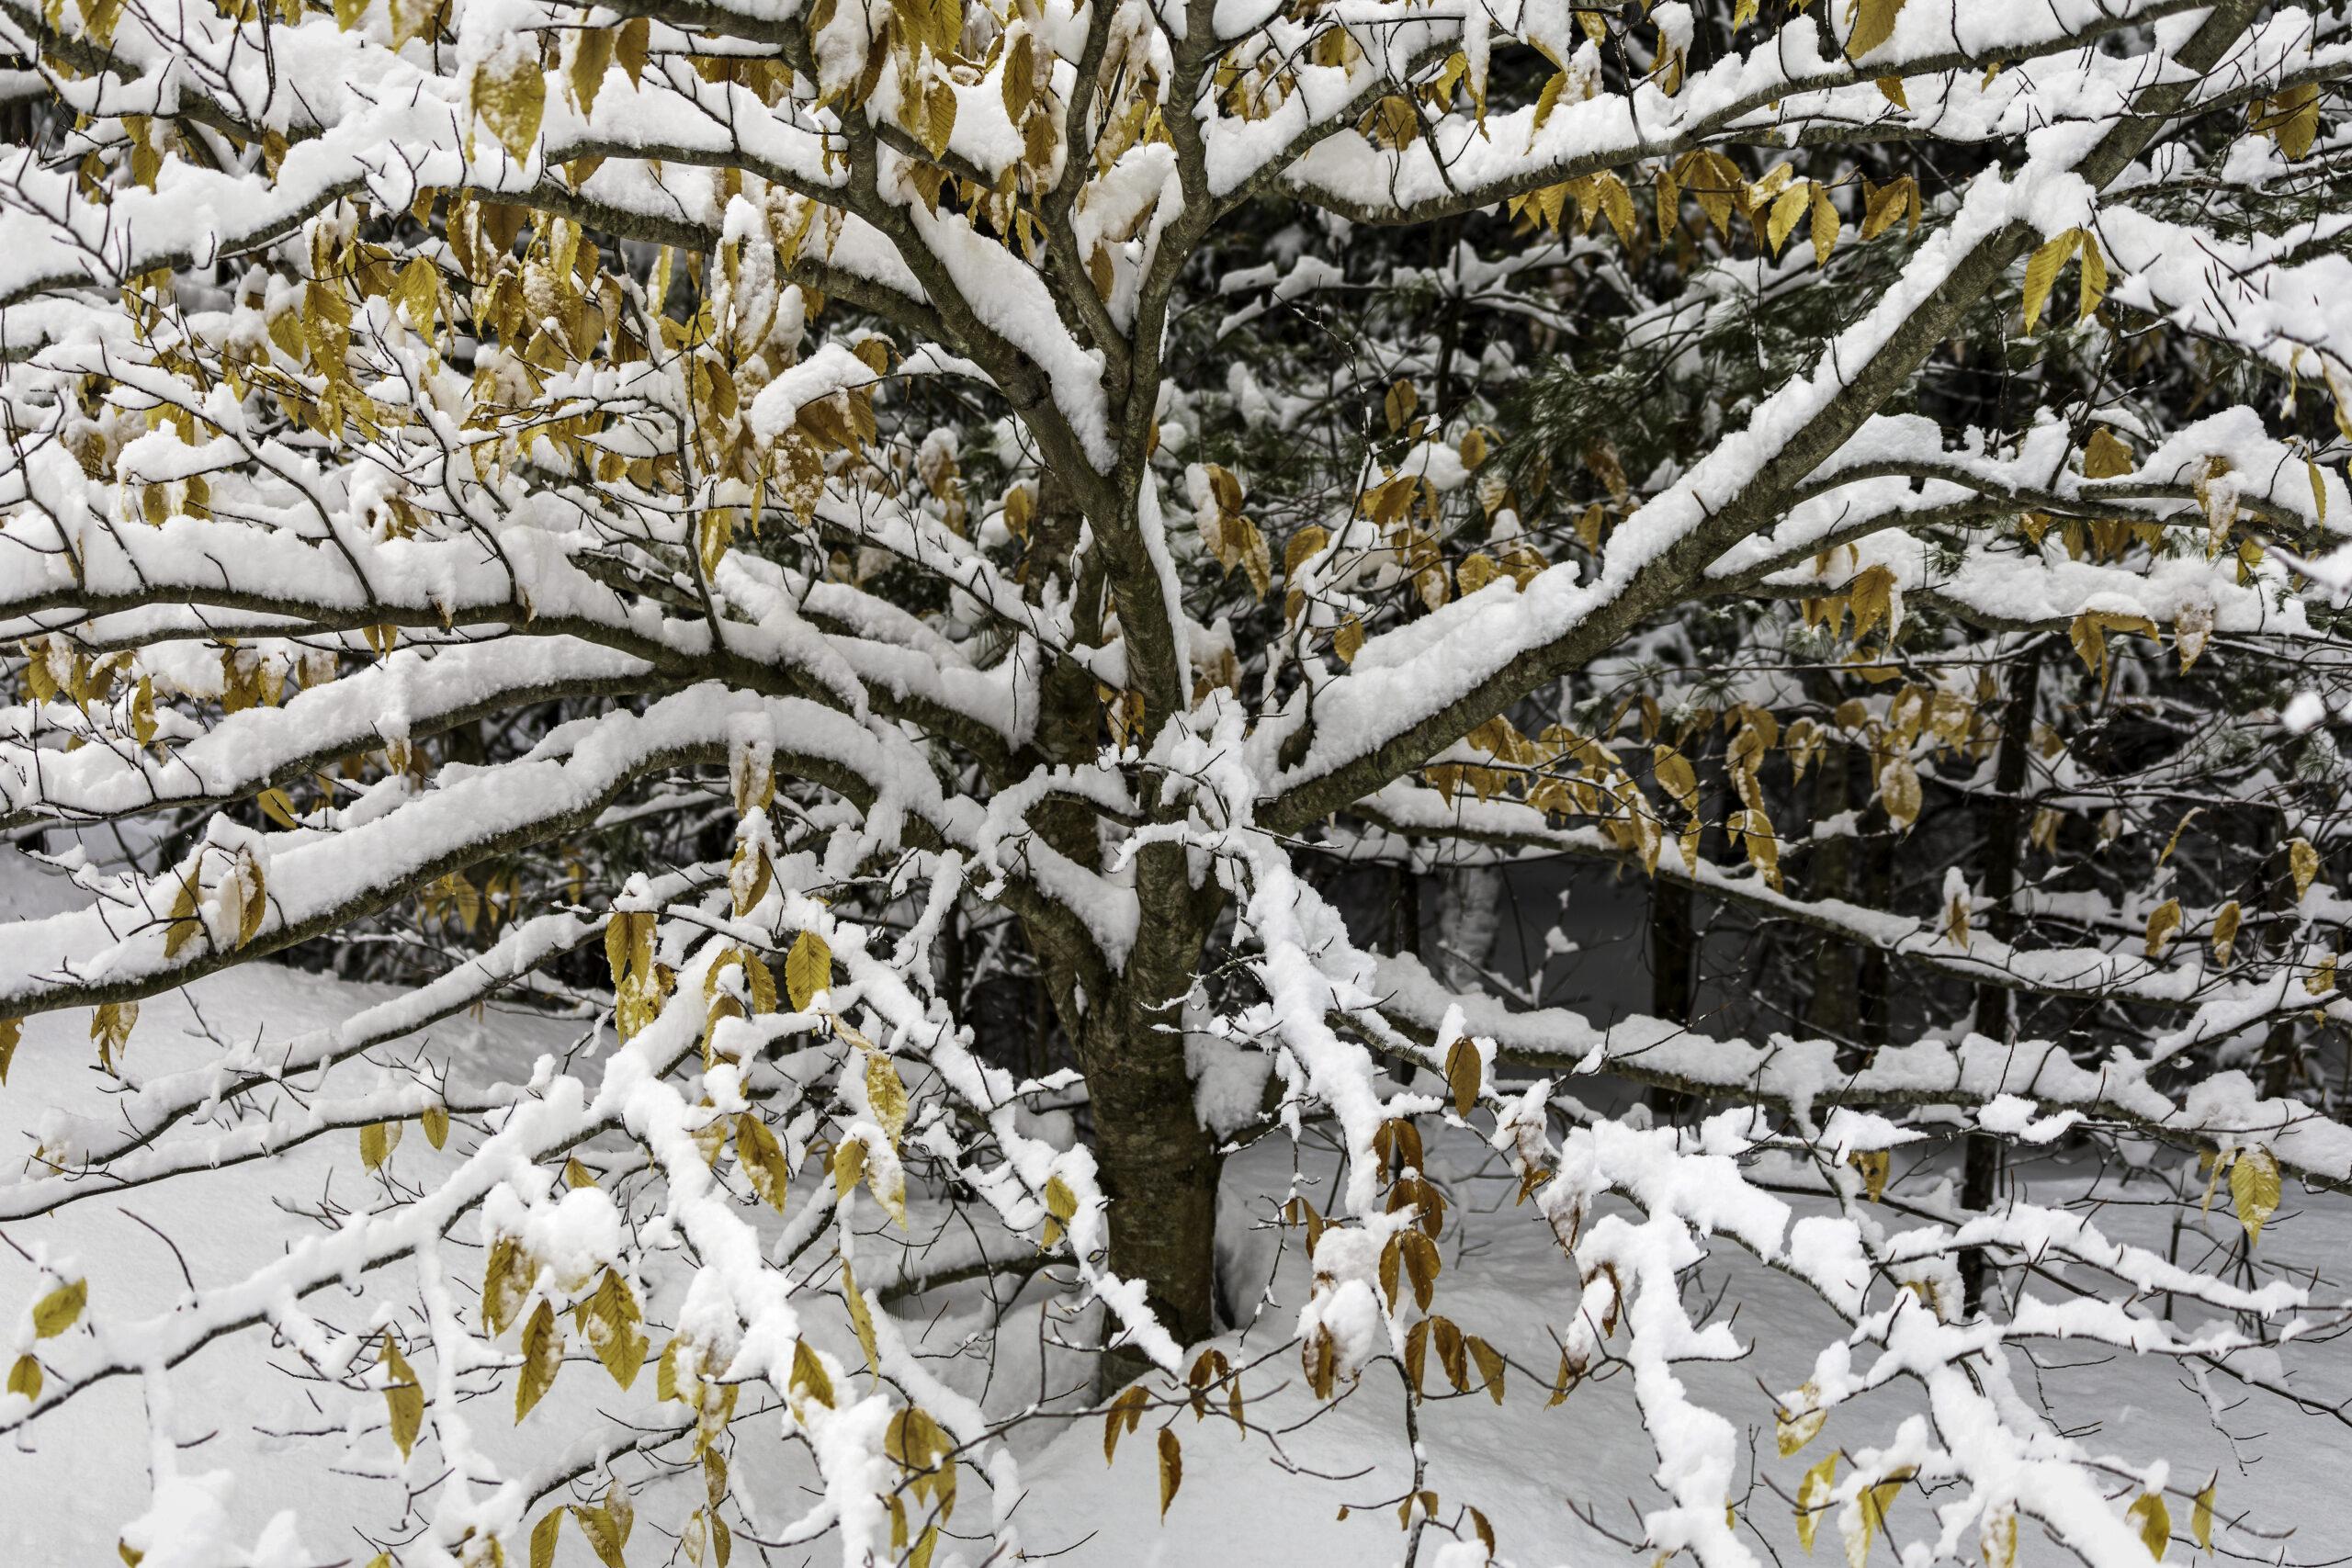 Snow at Last, Snow at Last!